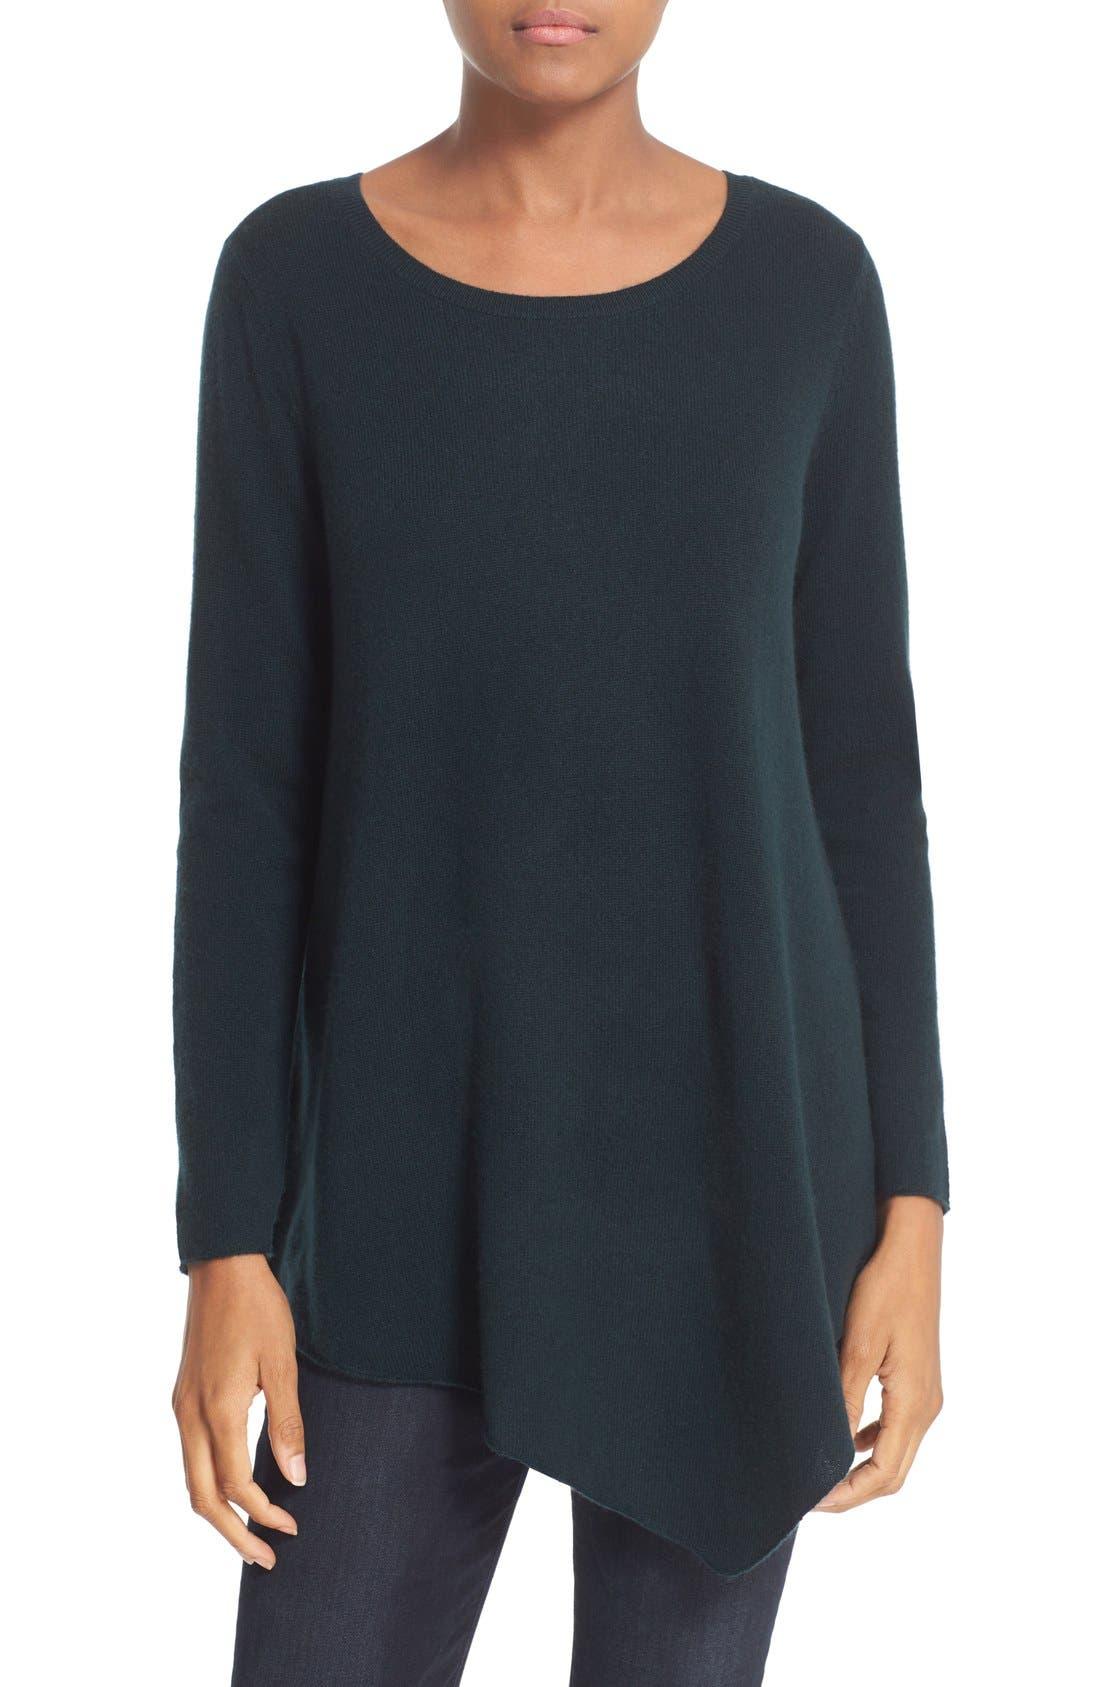 Joie 'Tambrel' Asymmetrical Sweater Tunic